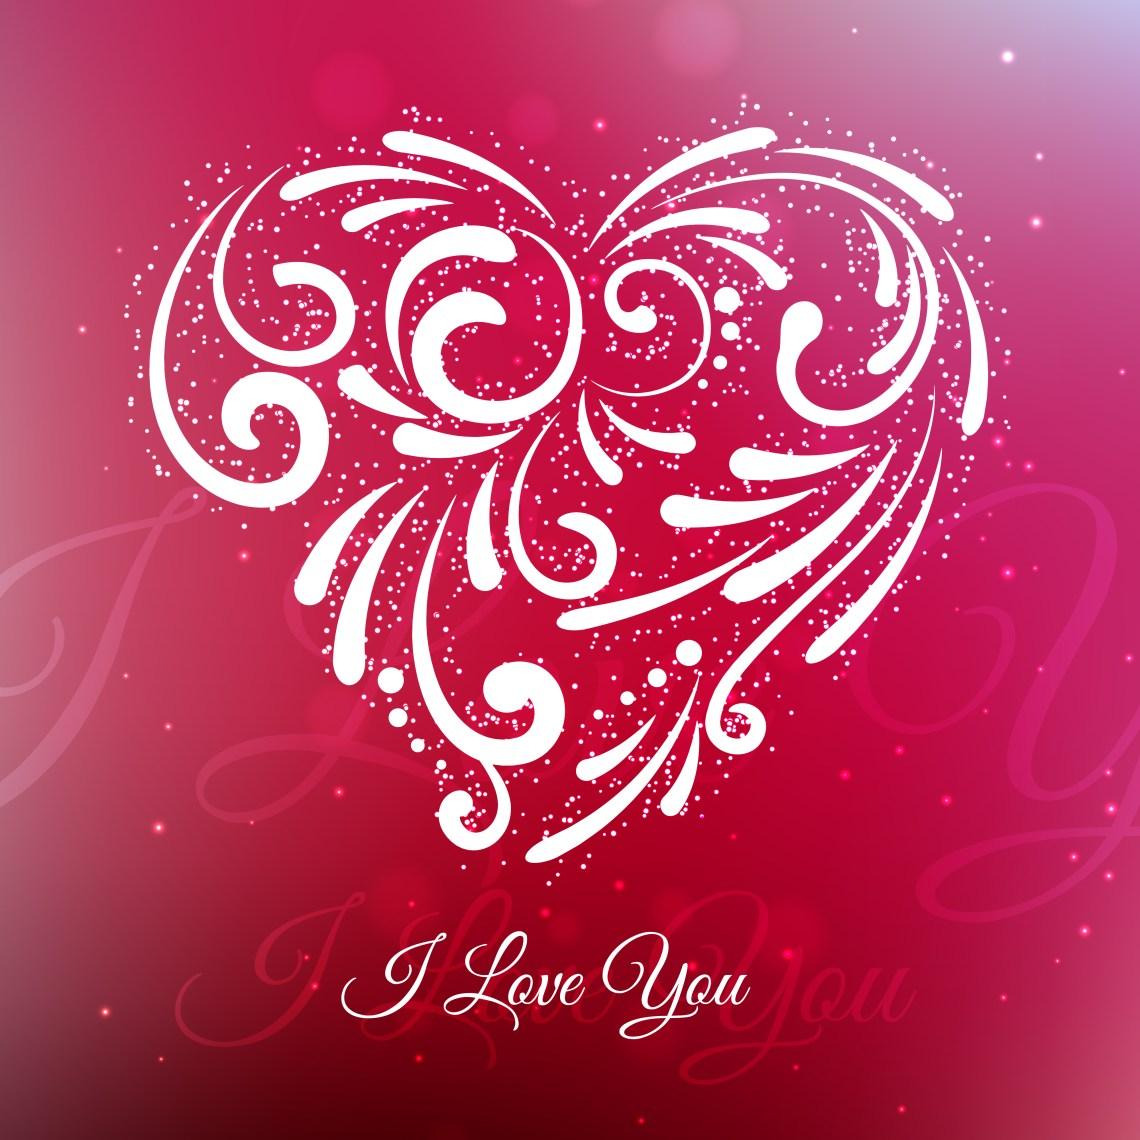 Download creative love heart background vector design illustration ...